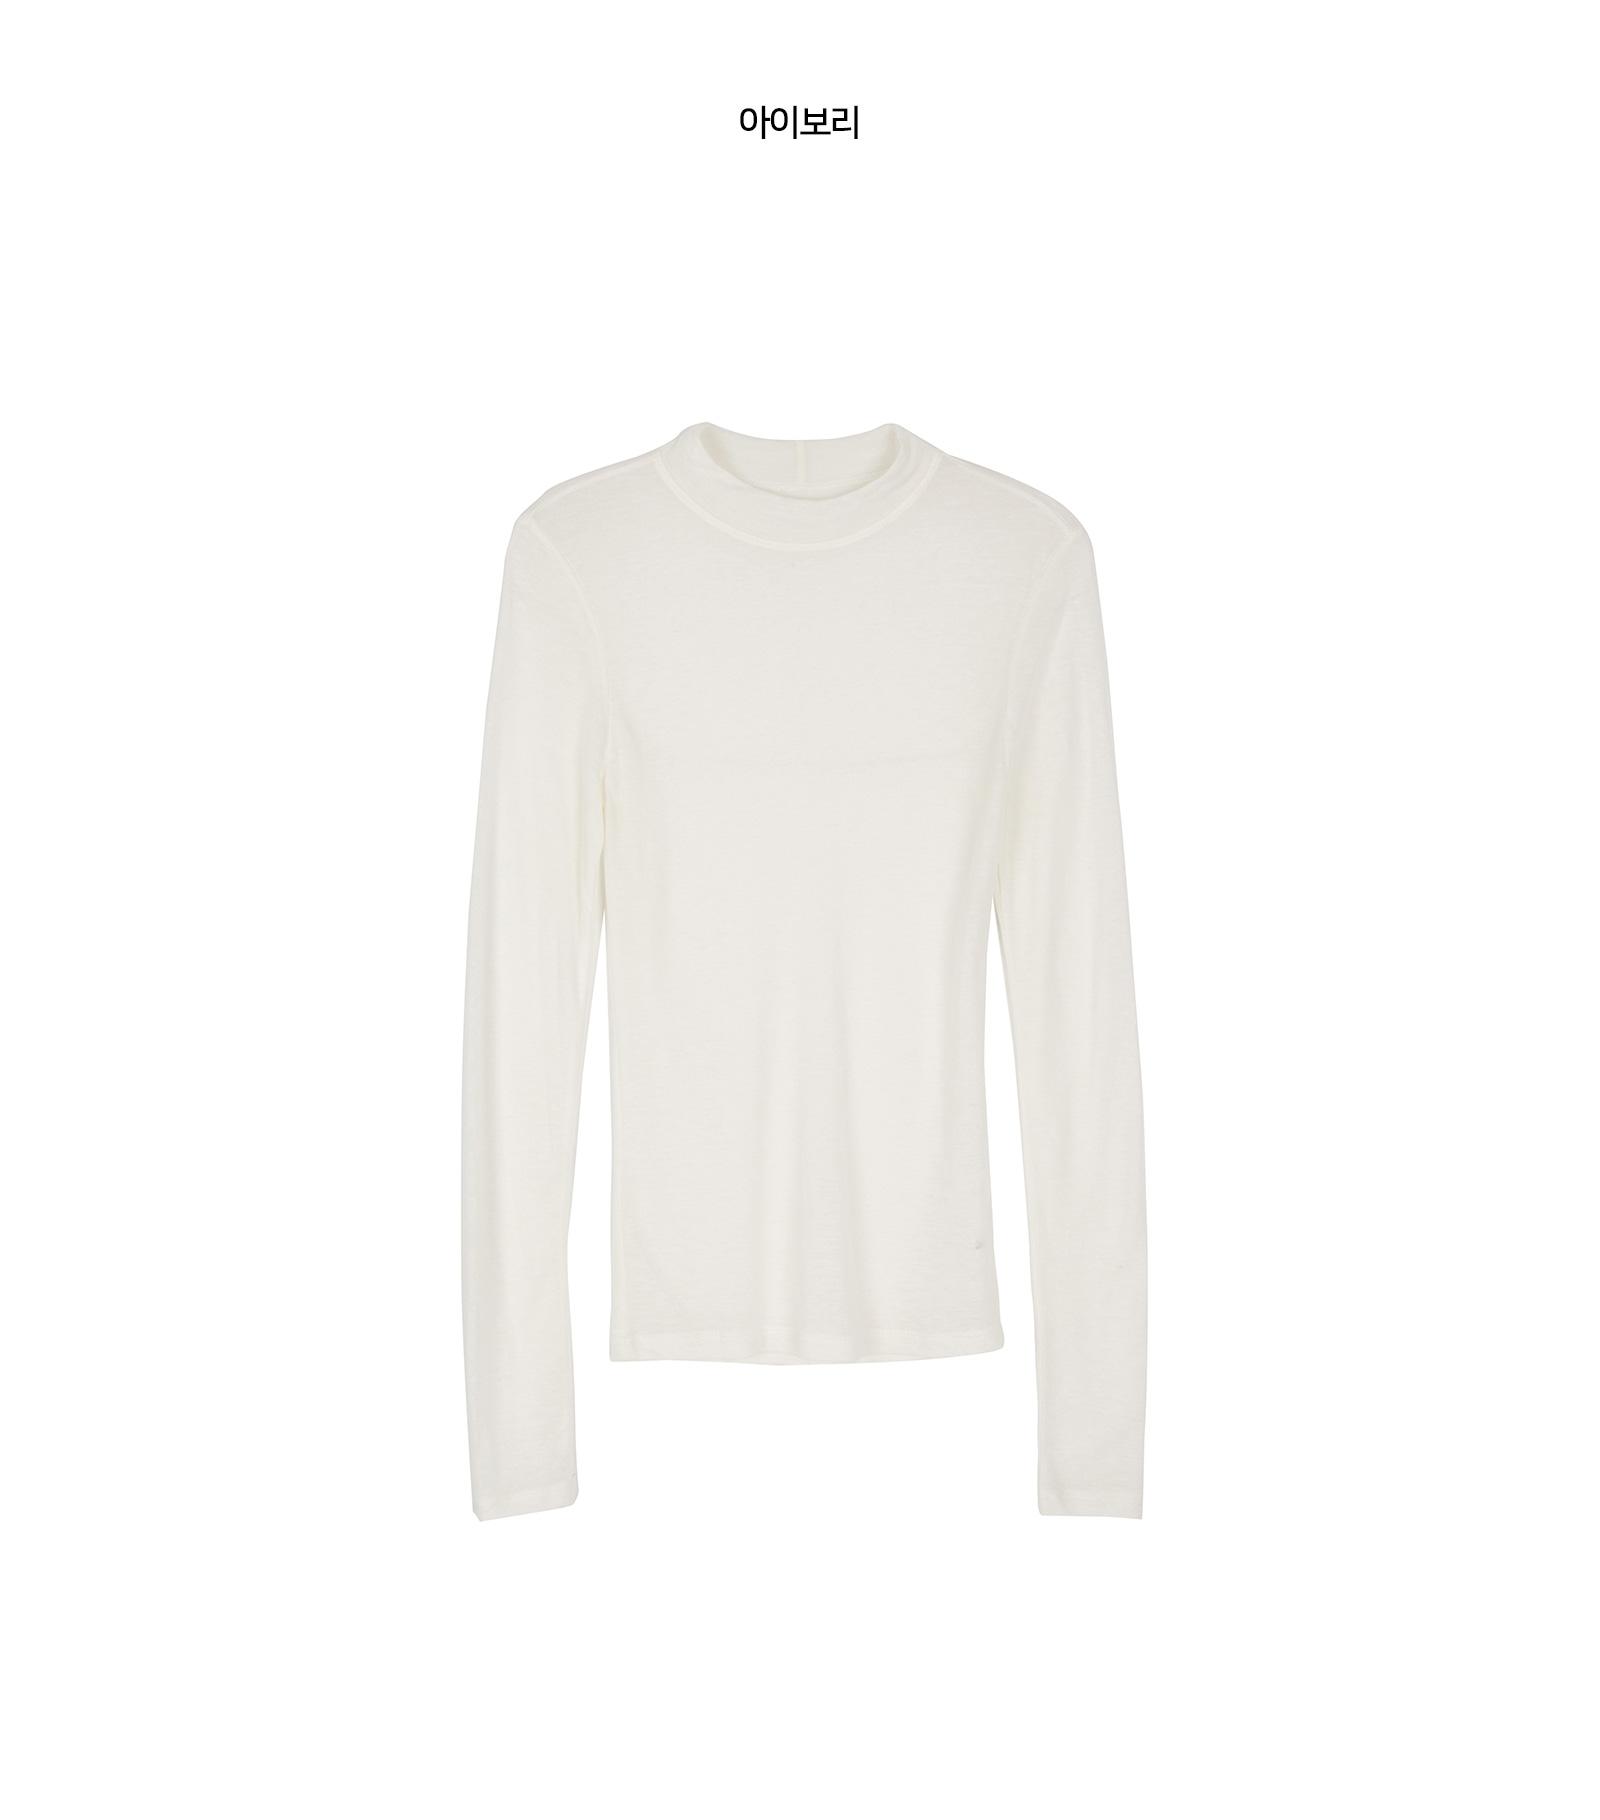 Useful see-through long sleeve T-shirt